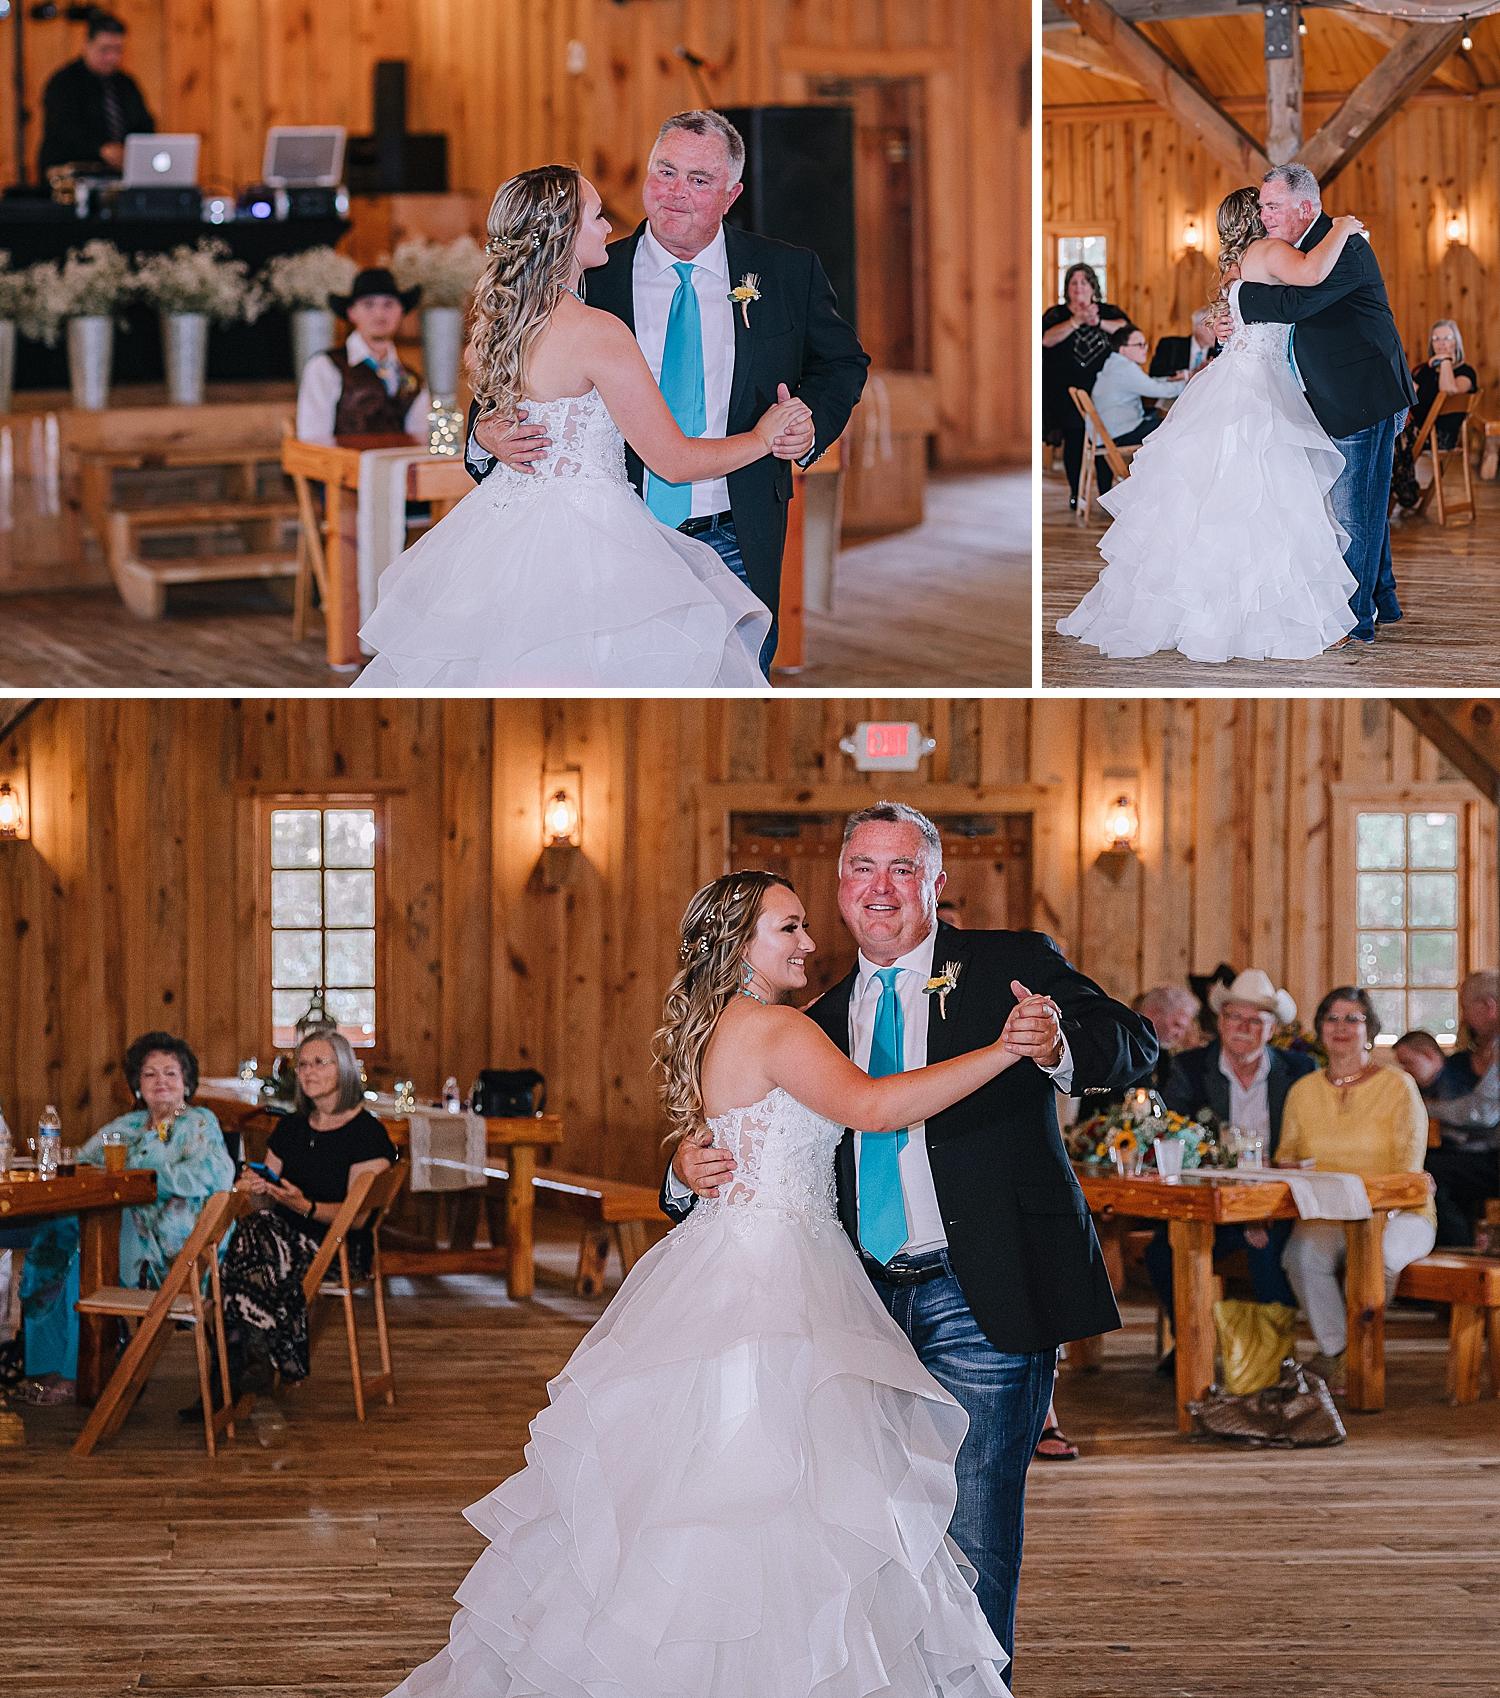 Carly-Barton-Photography-Old-Town-Texas-Rustic-Wedding-Photos-Sunflowers-Boots-Kyle-Texas_0110.jpg